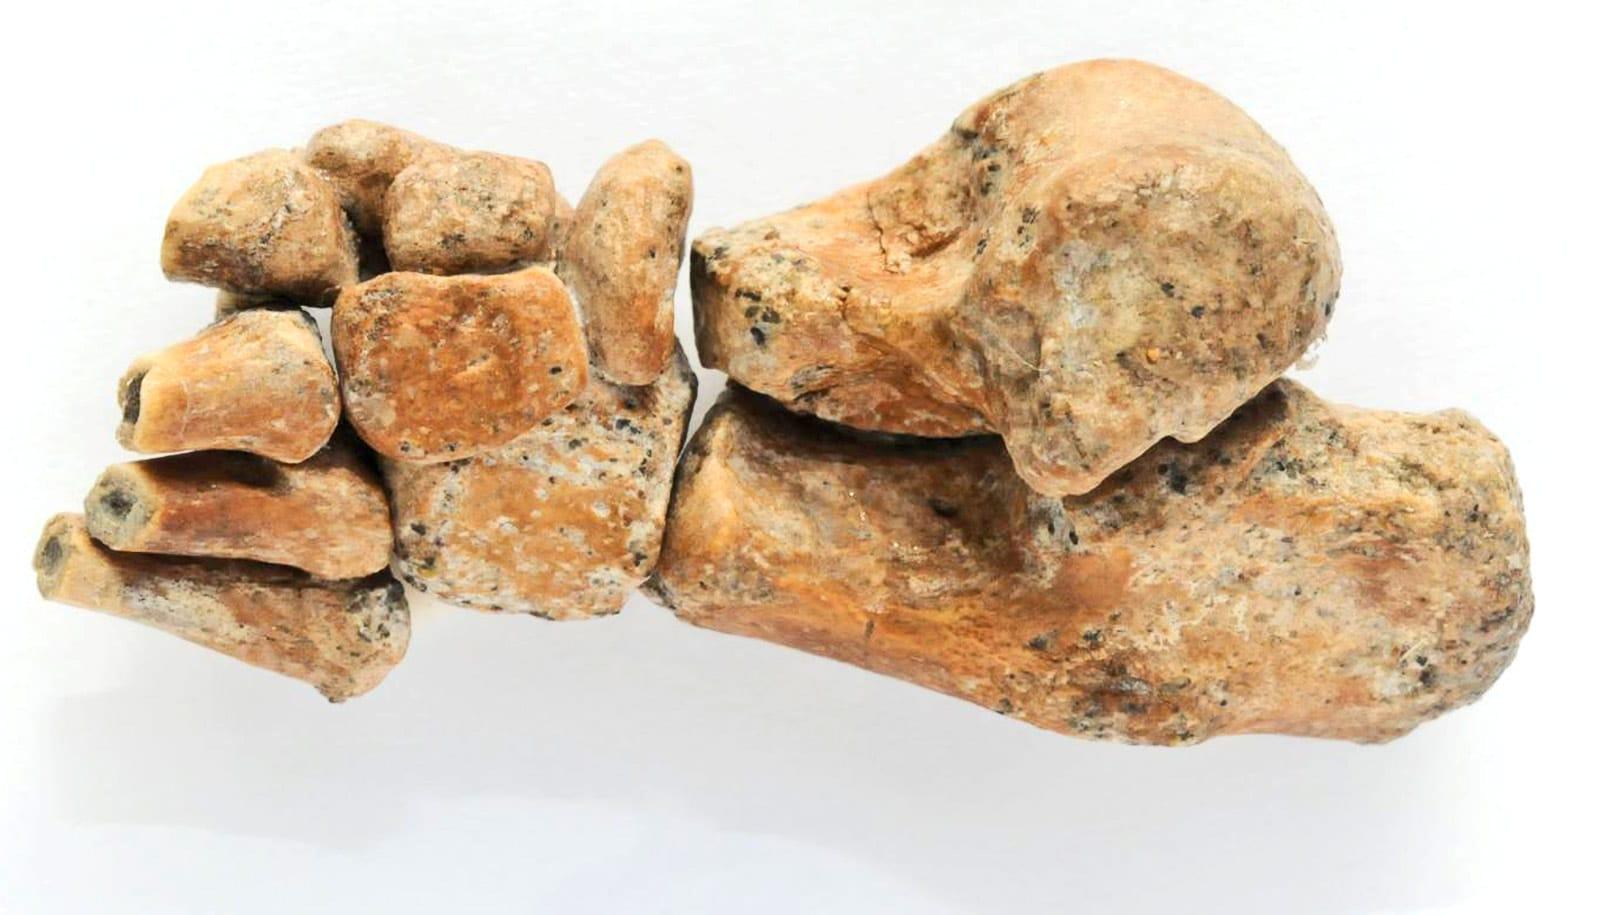 Dikika toddler foot fossil